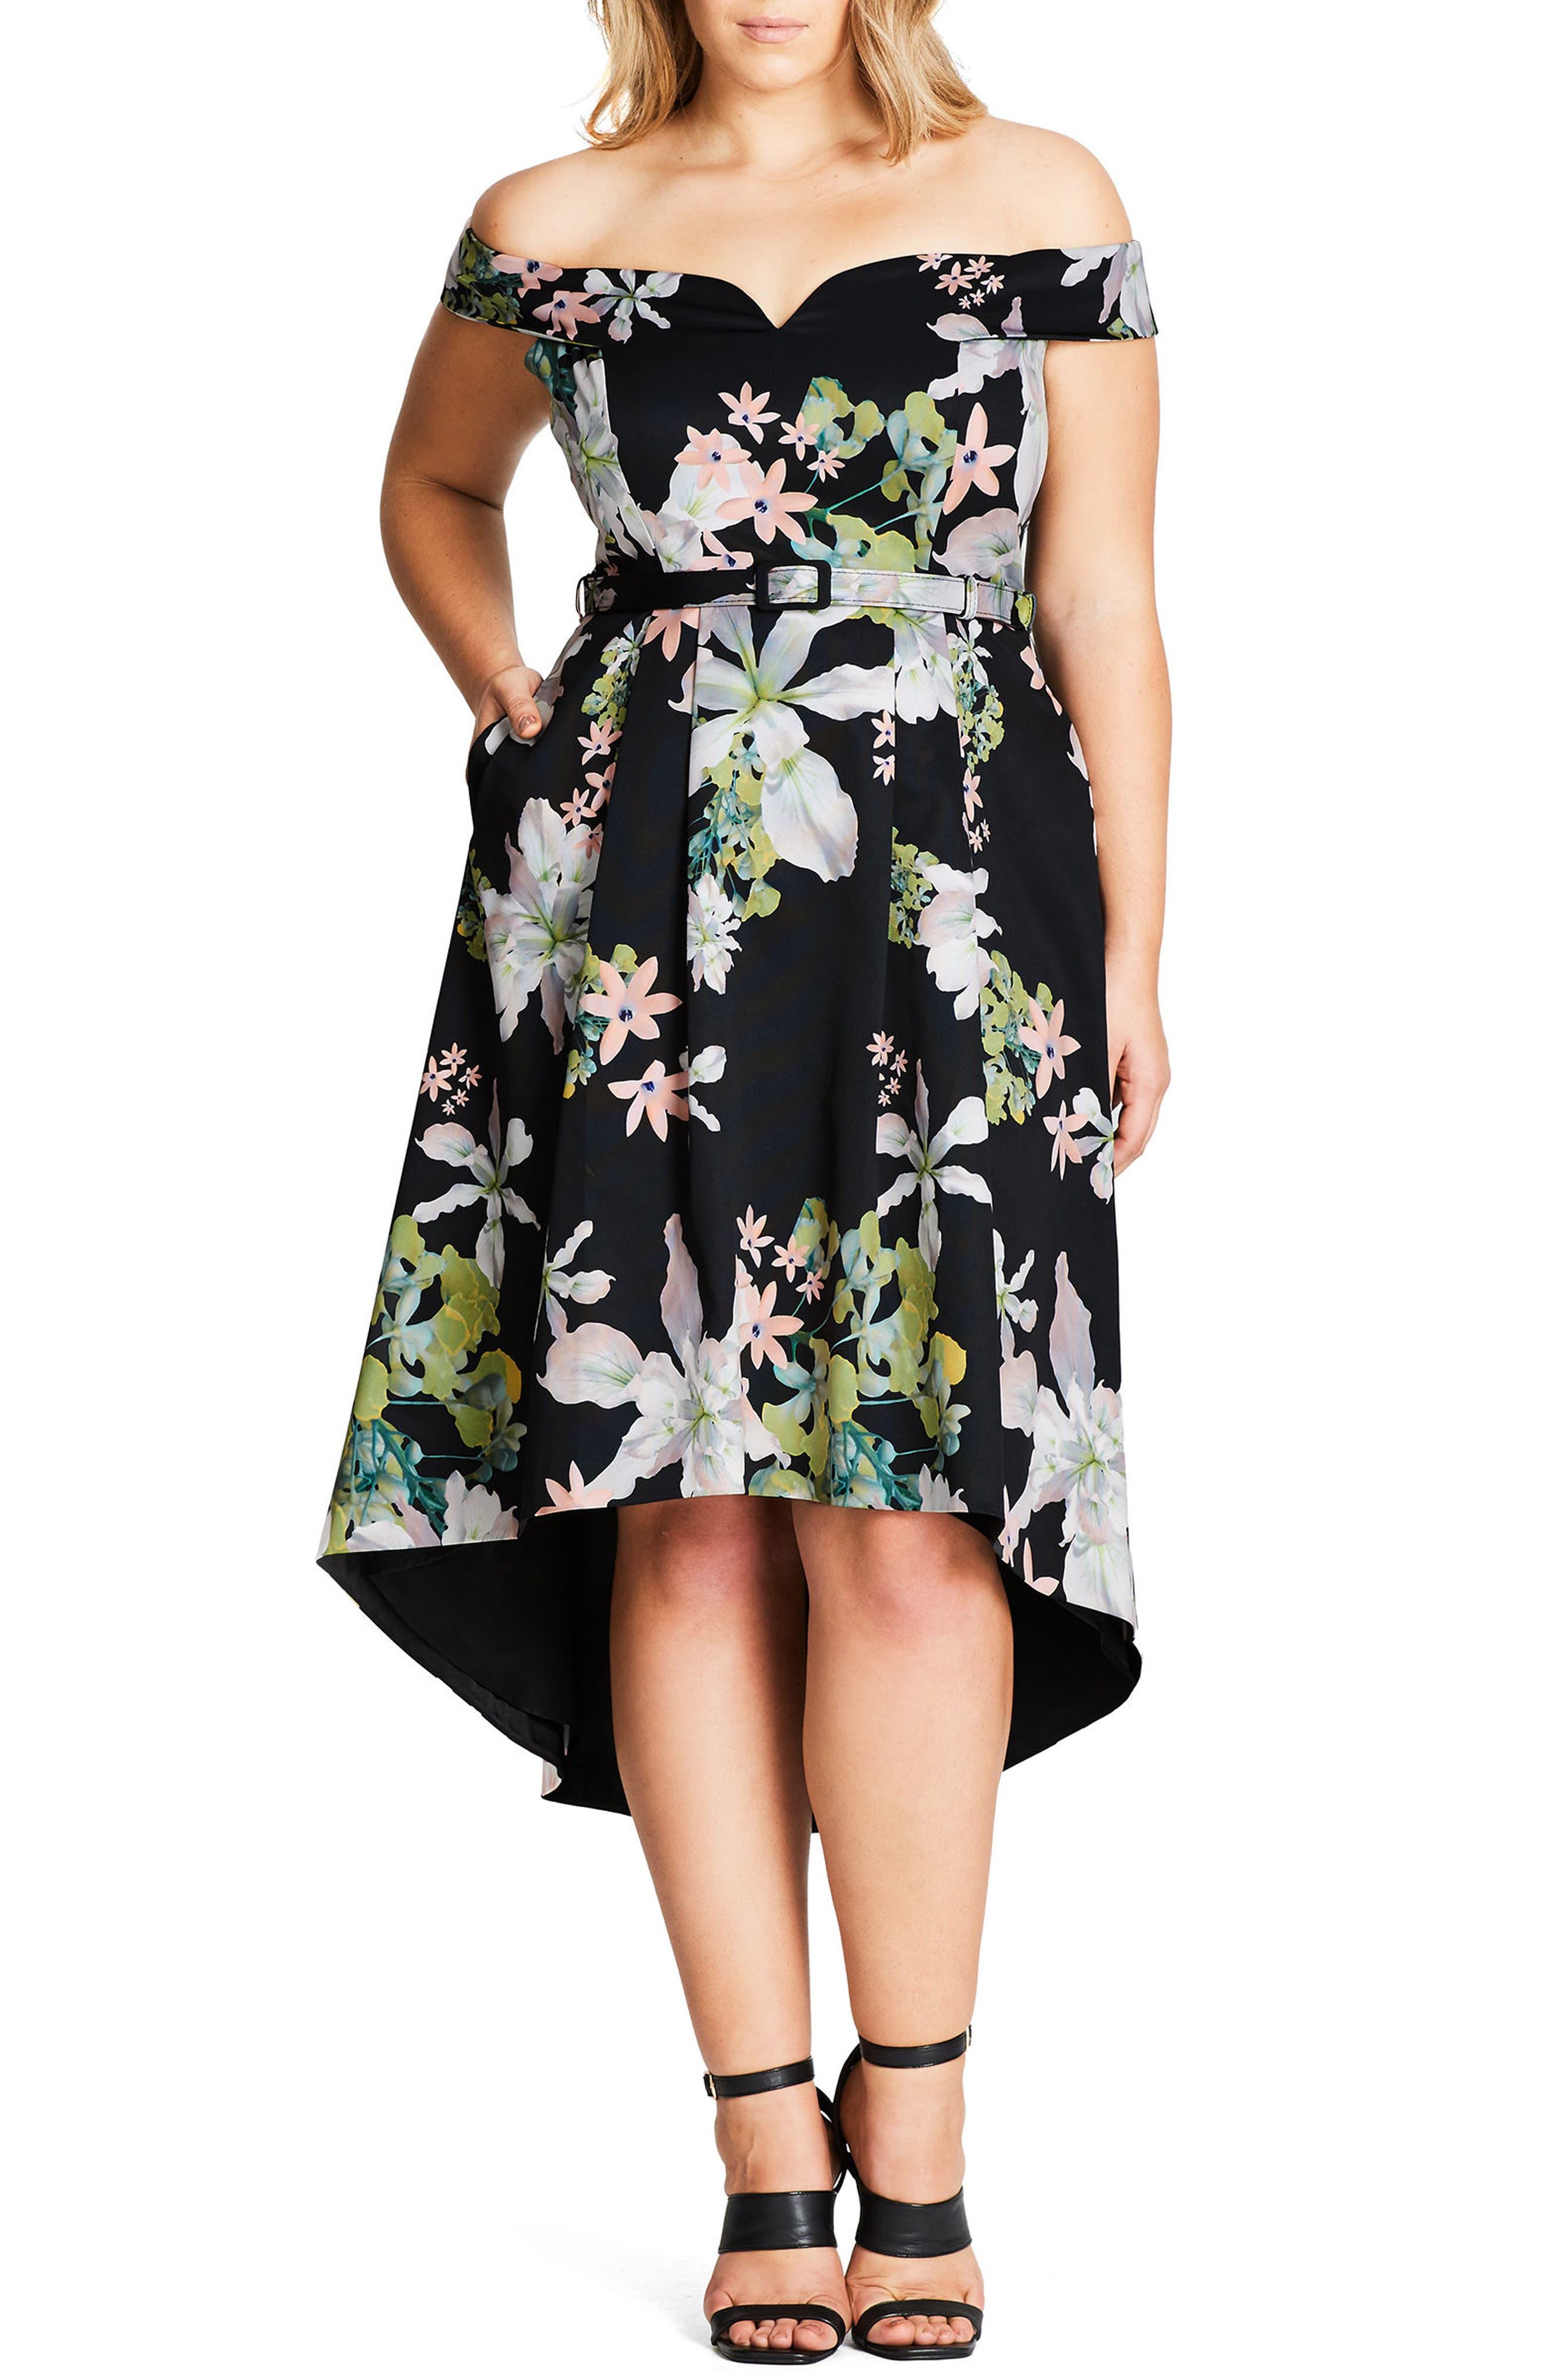 Spring Belted Off the Shoulder Dress,                             Main thumbnail 1, color,                             001